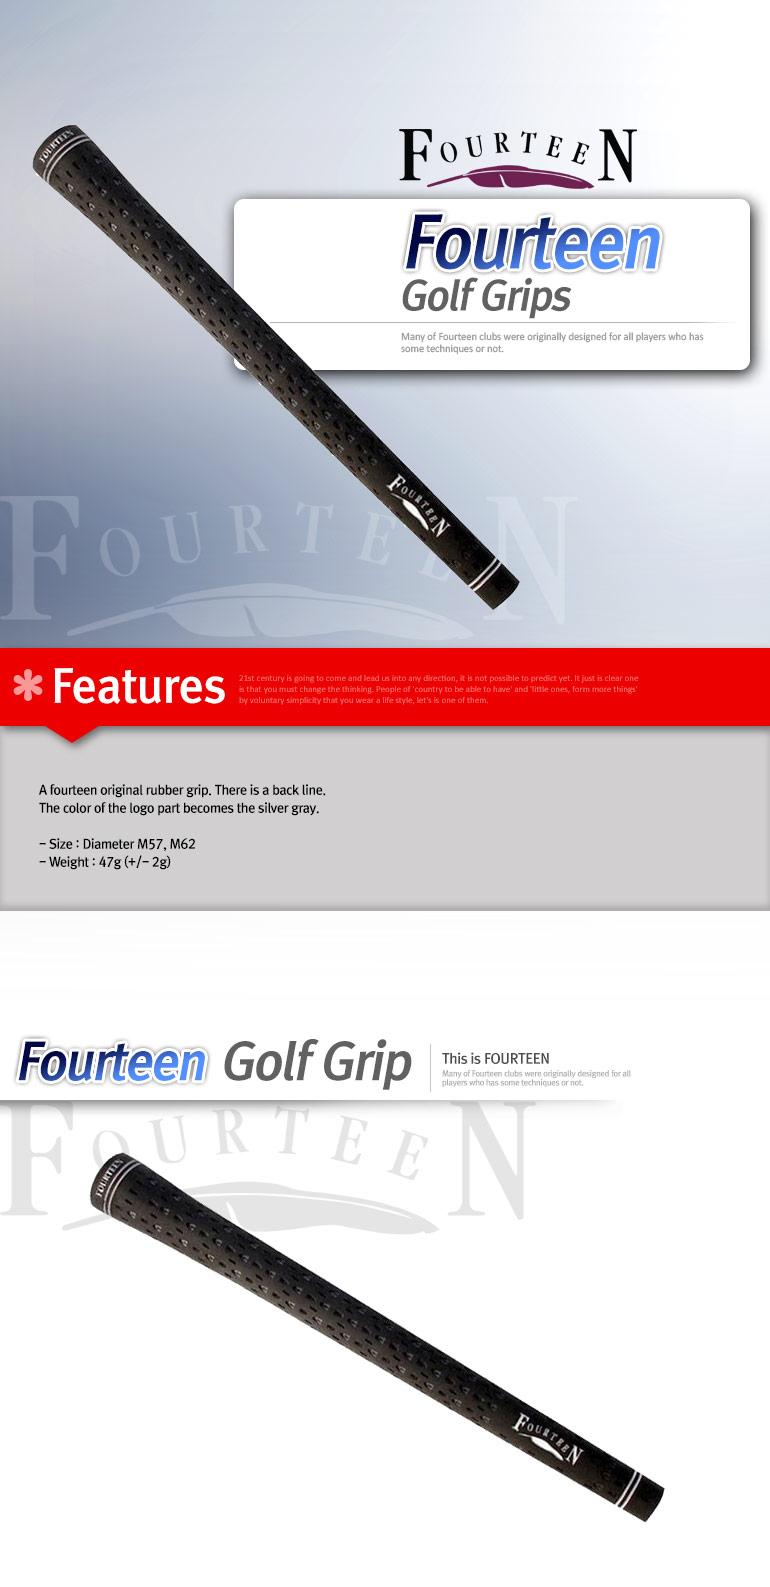 Fourtee_Grip_desc.jpg